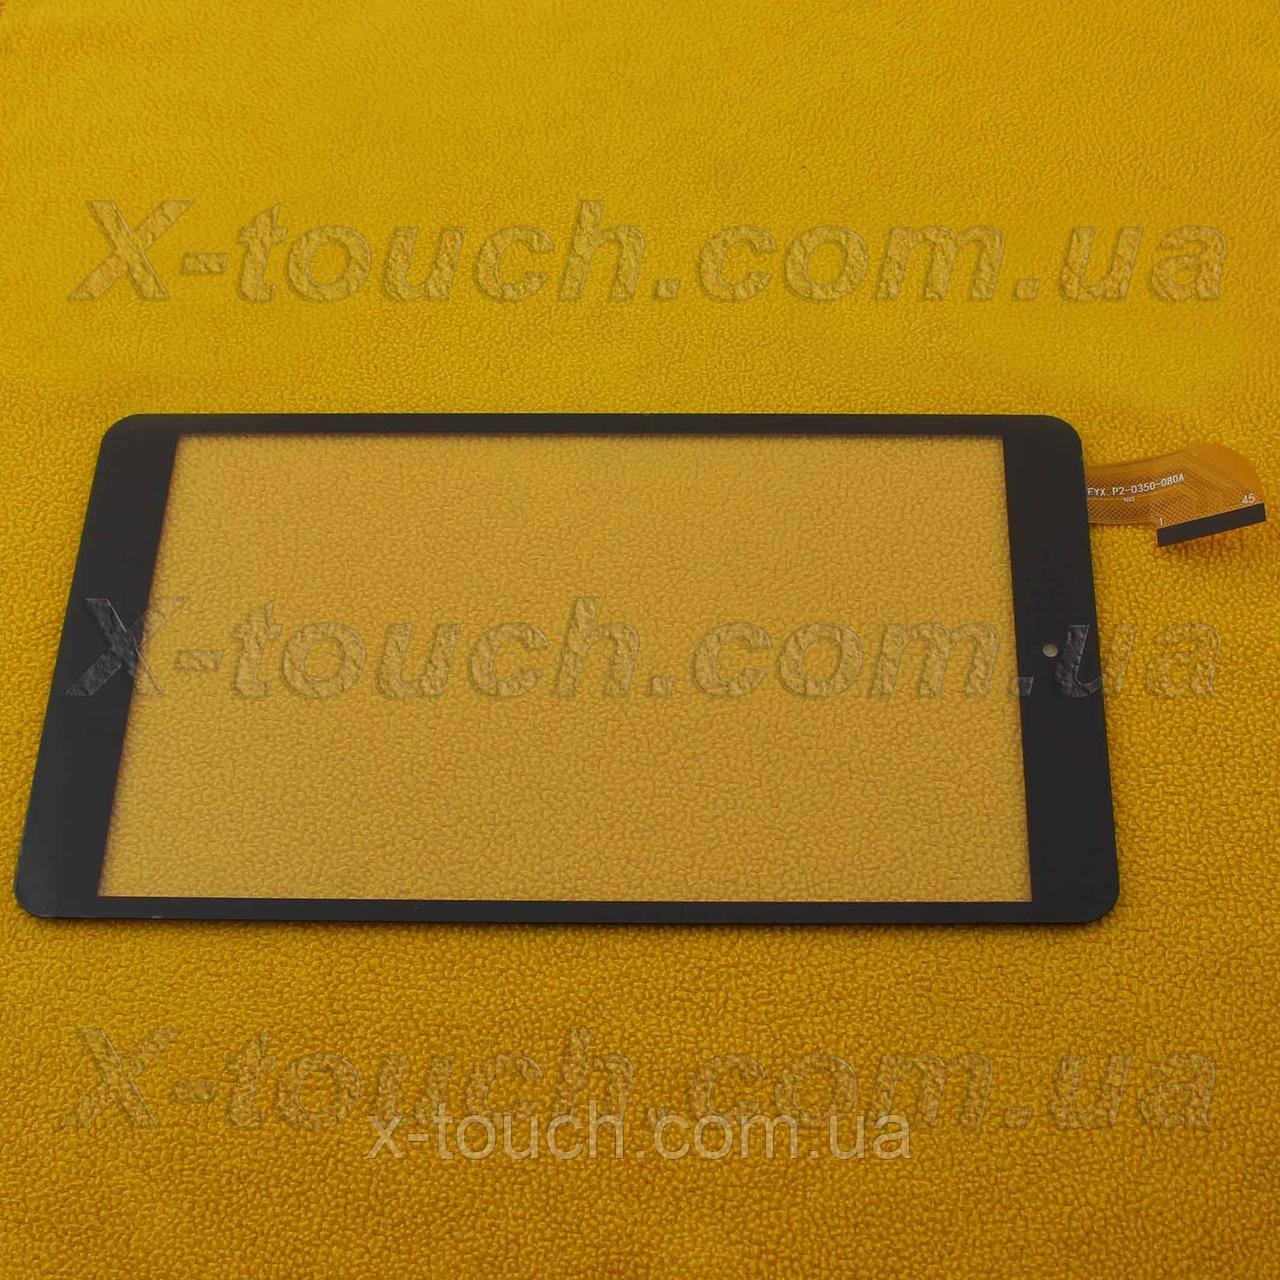 Тачскрин, сенсор Digma Optima 8001M для планшета